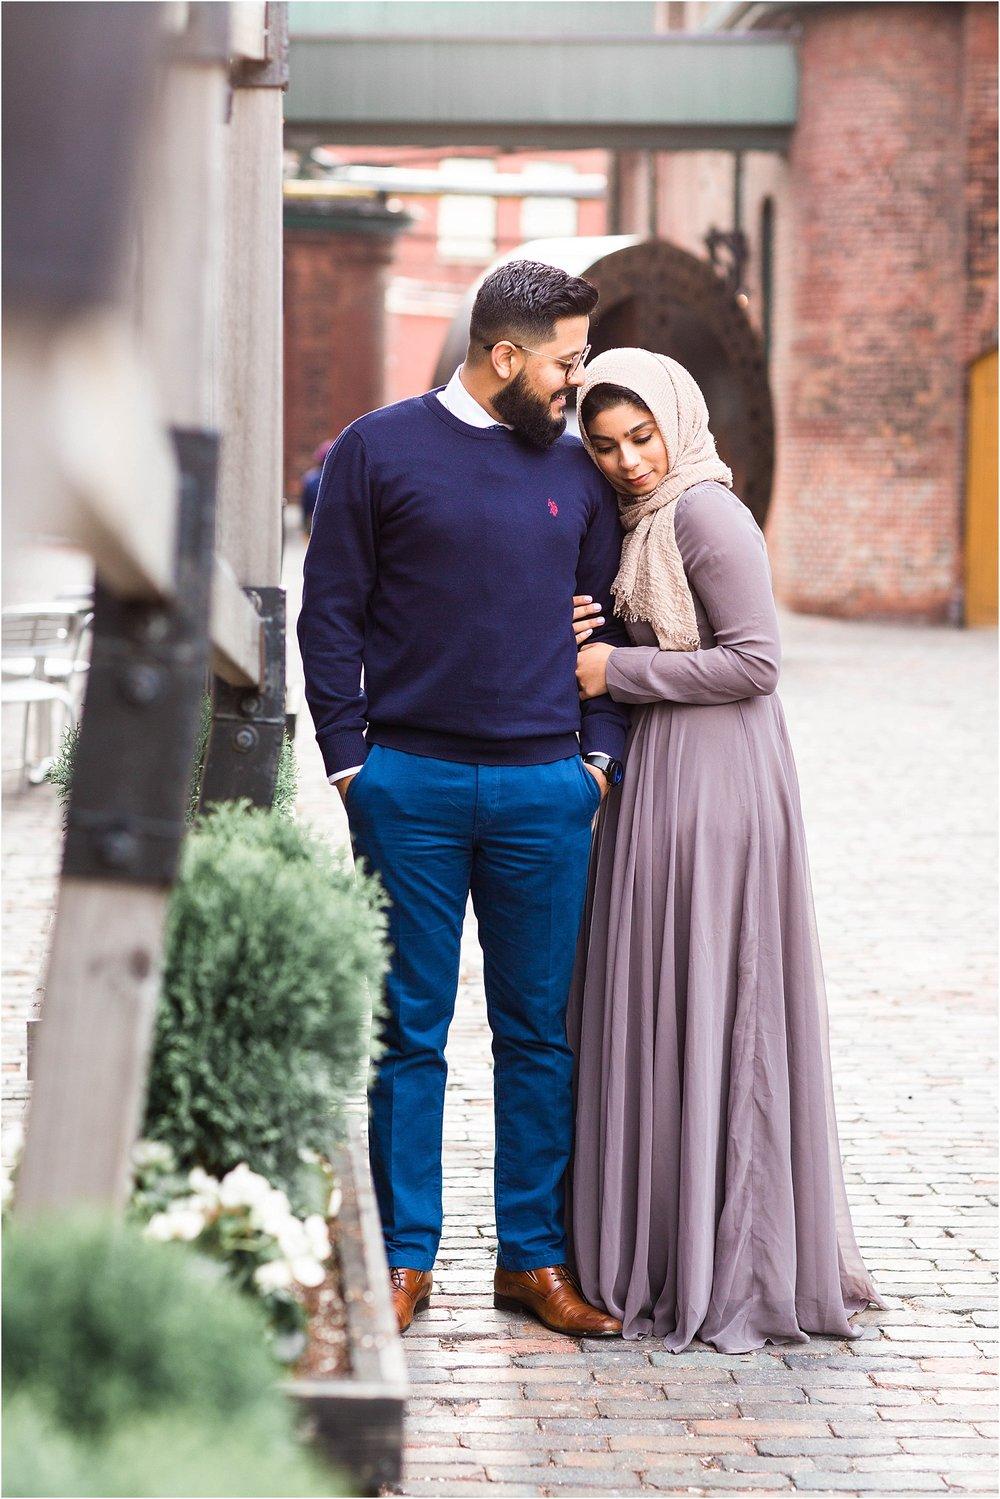 Polson-Pier-Distillery-District-Engagement-Session-Toronto-Mississauga-Brampton-Scarborough-GTA-Pakistani-Indian-Wedding-Engagement-Photographer-Photography_0029.jpg